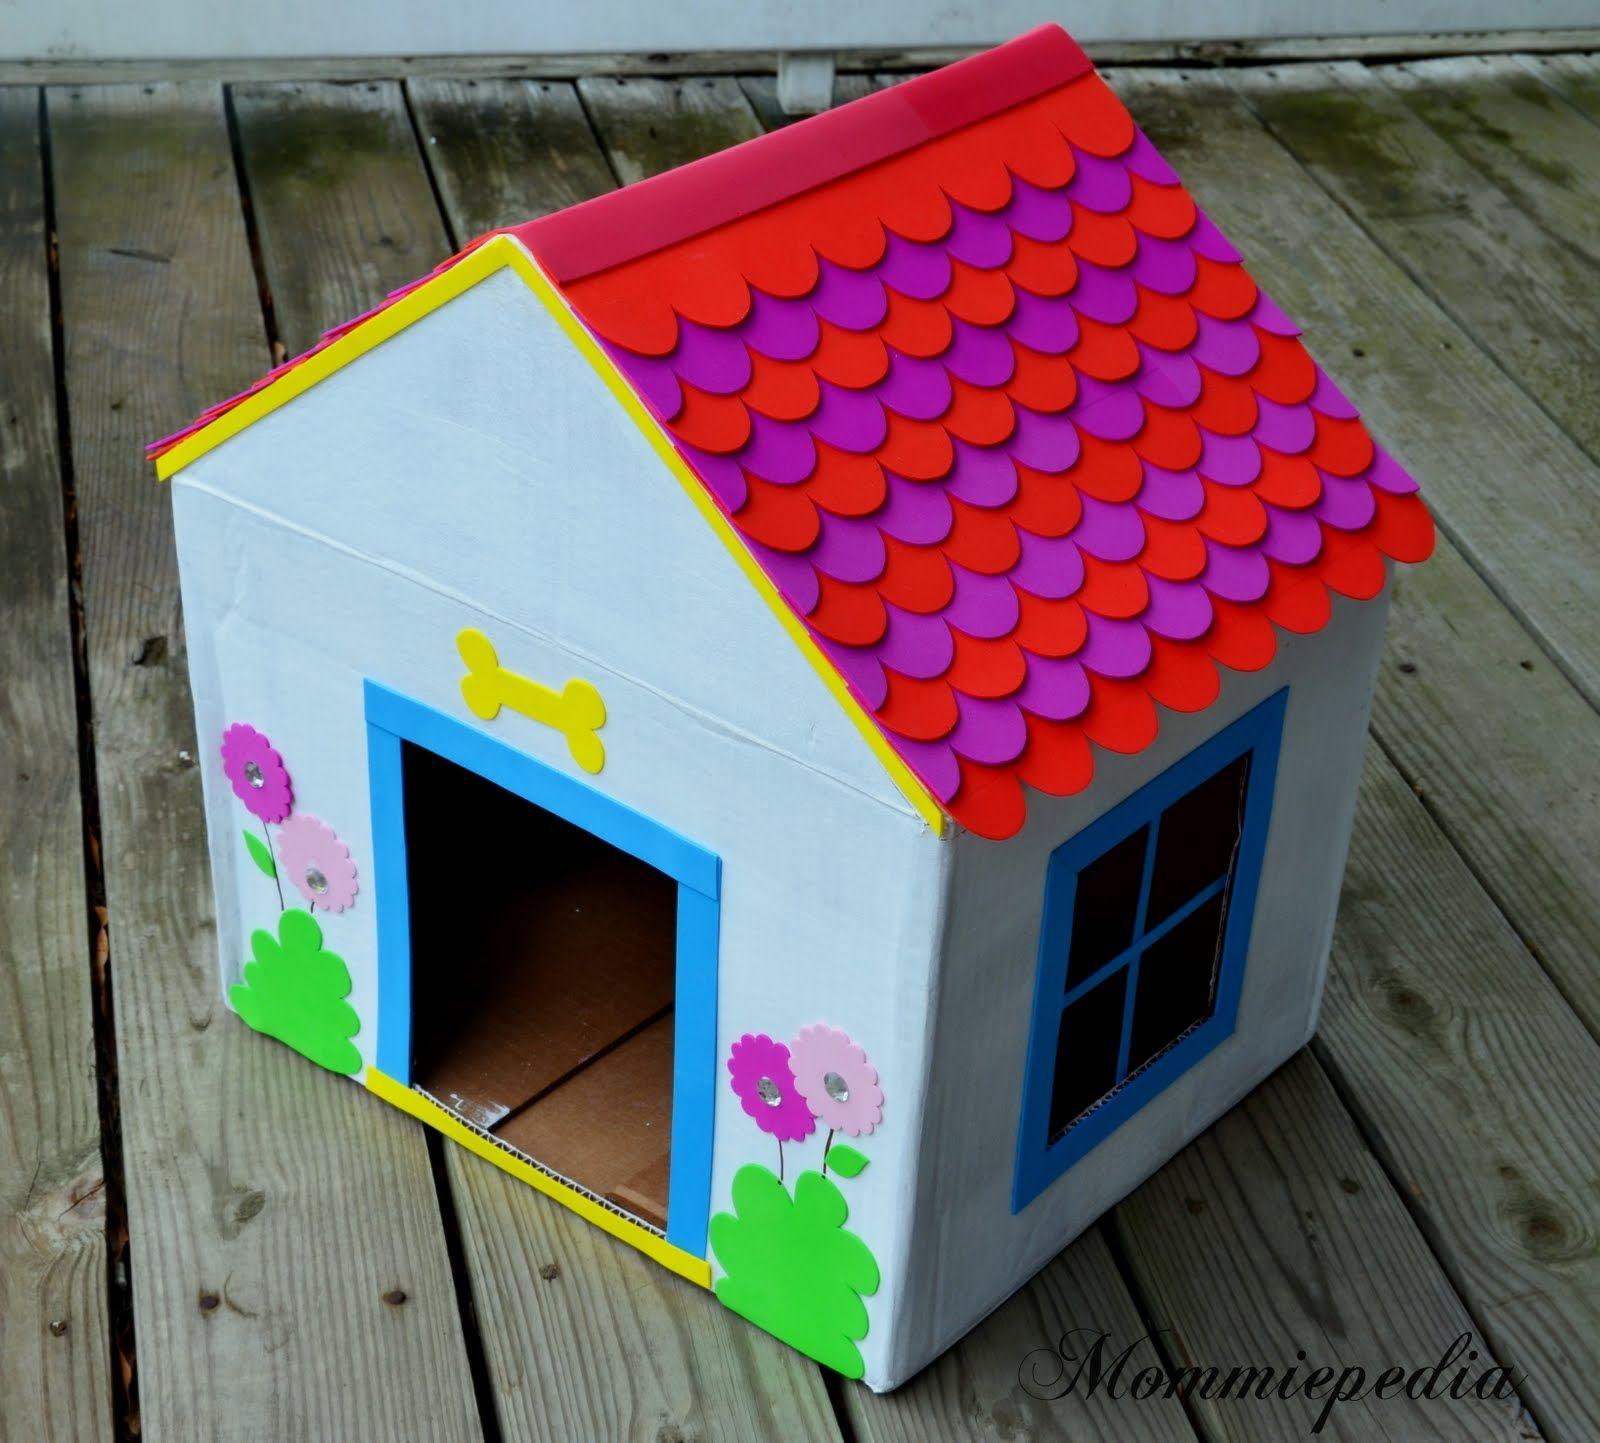 Mommiepedia Dog House From A Recycled Box Diy Stuffed Animals Dog House Diy Diy Dog Stuff [ 1443 x 1600 Pixel ]